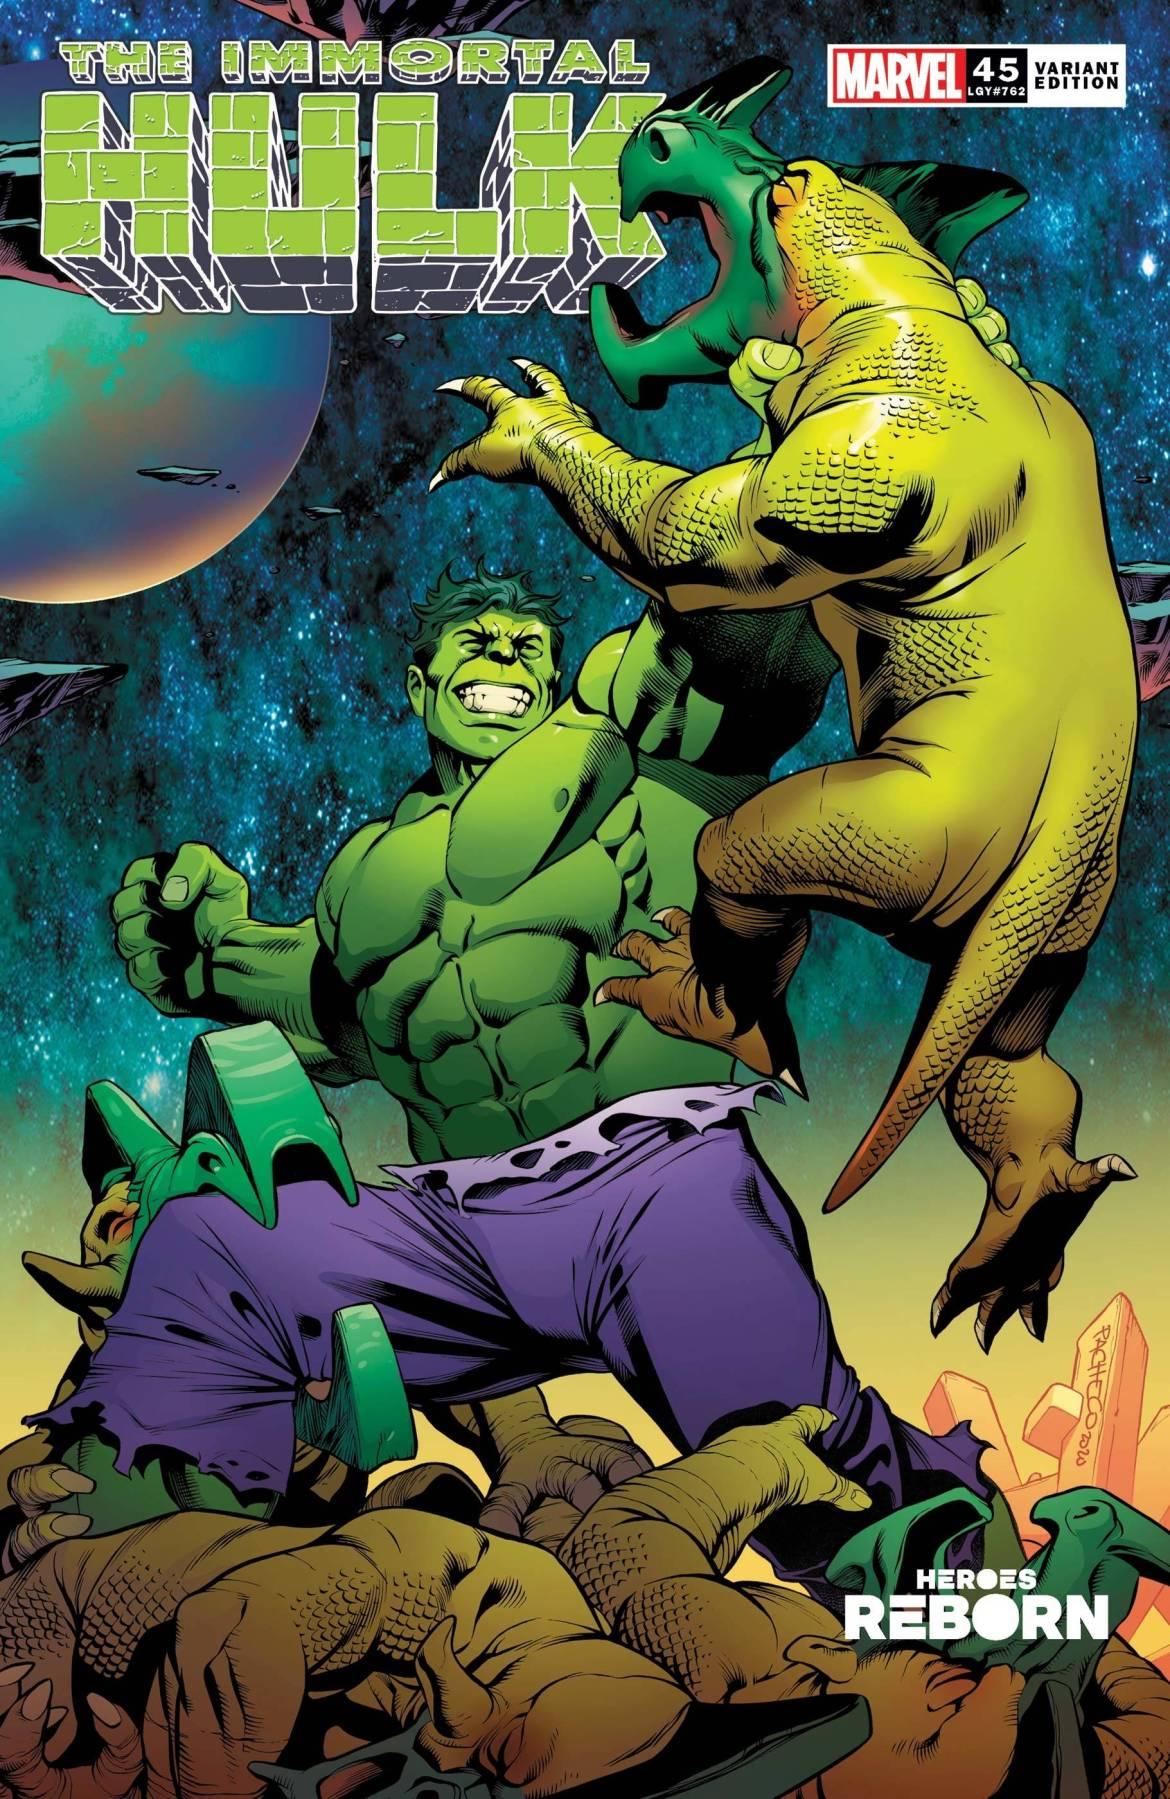 STL182293 ComicList: Marvel Comics New Releases for 04/07/2021